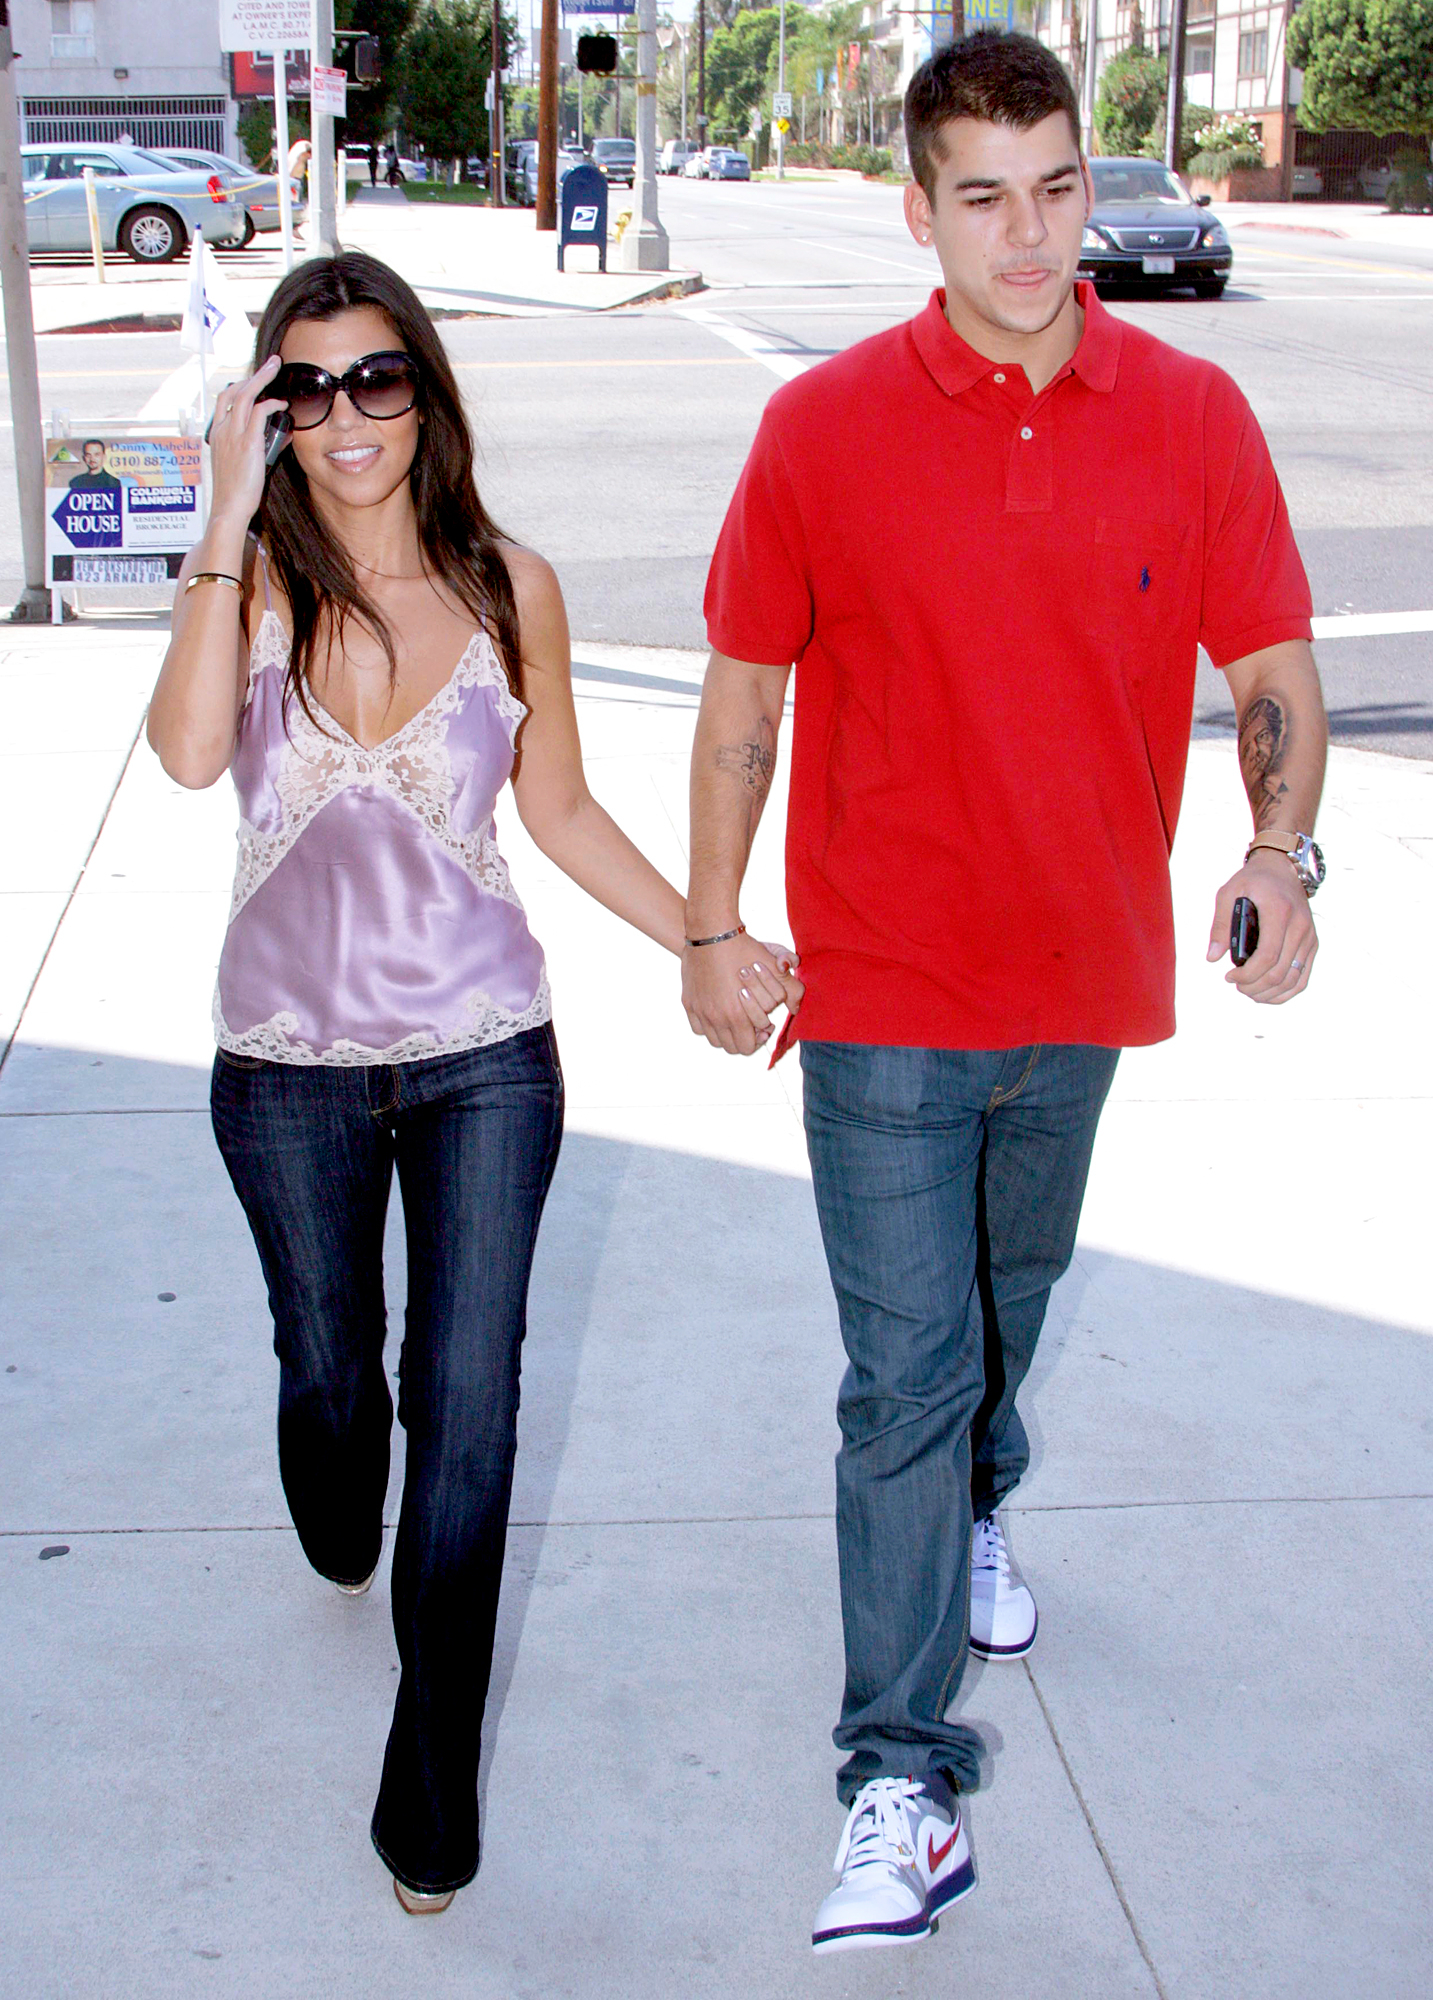 Kourtney Kardashian and Rob Kardashian